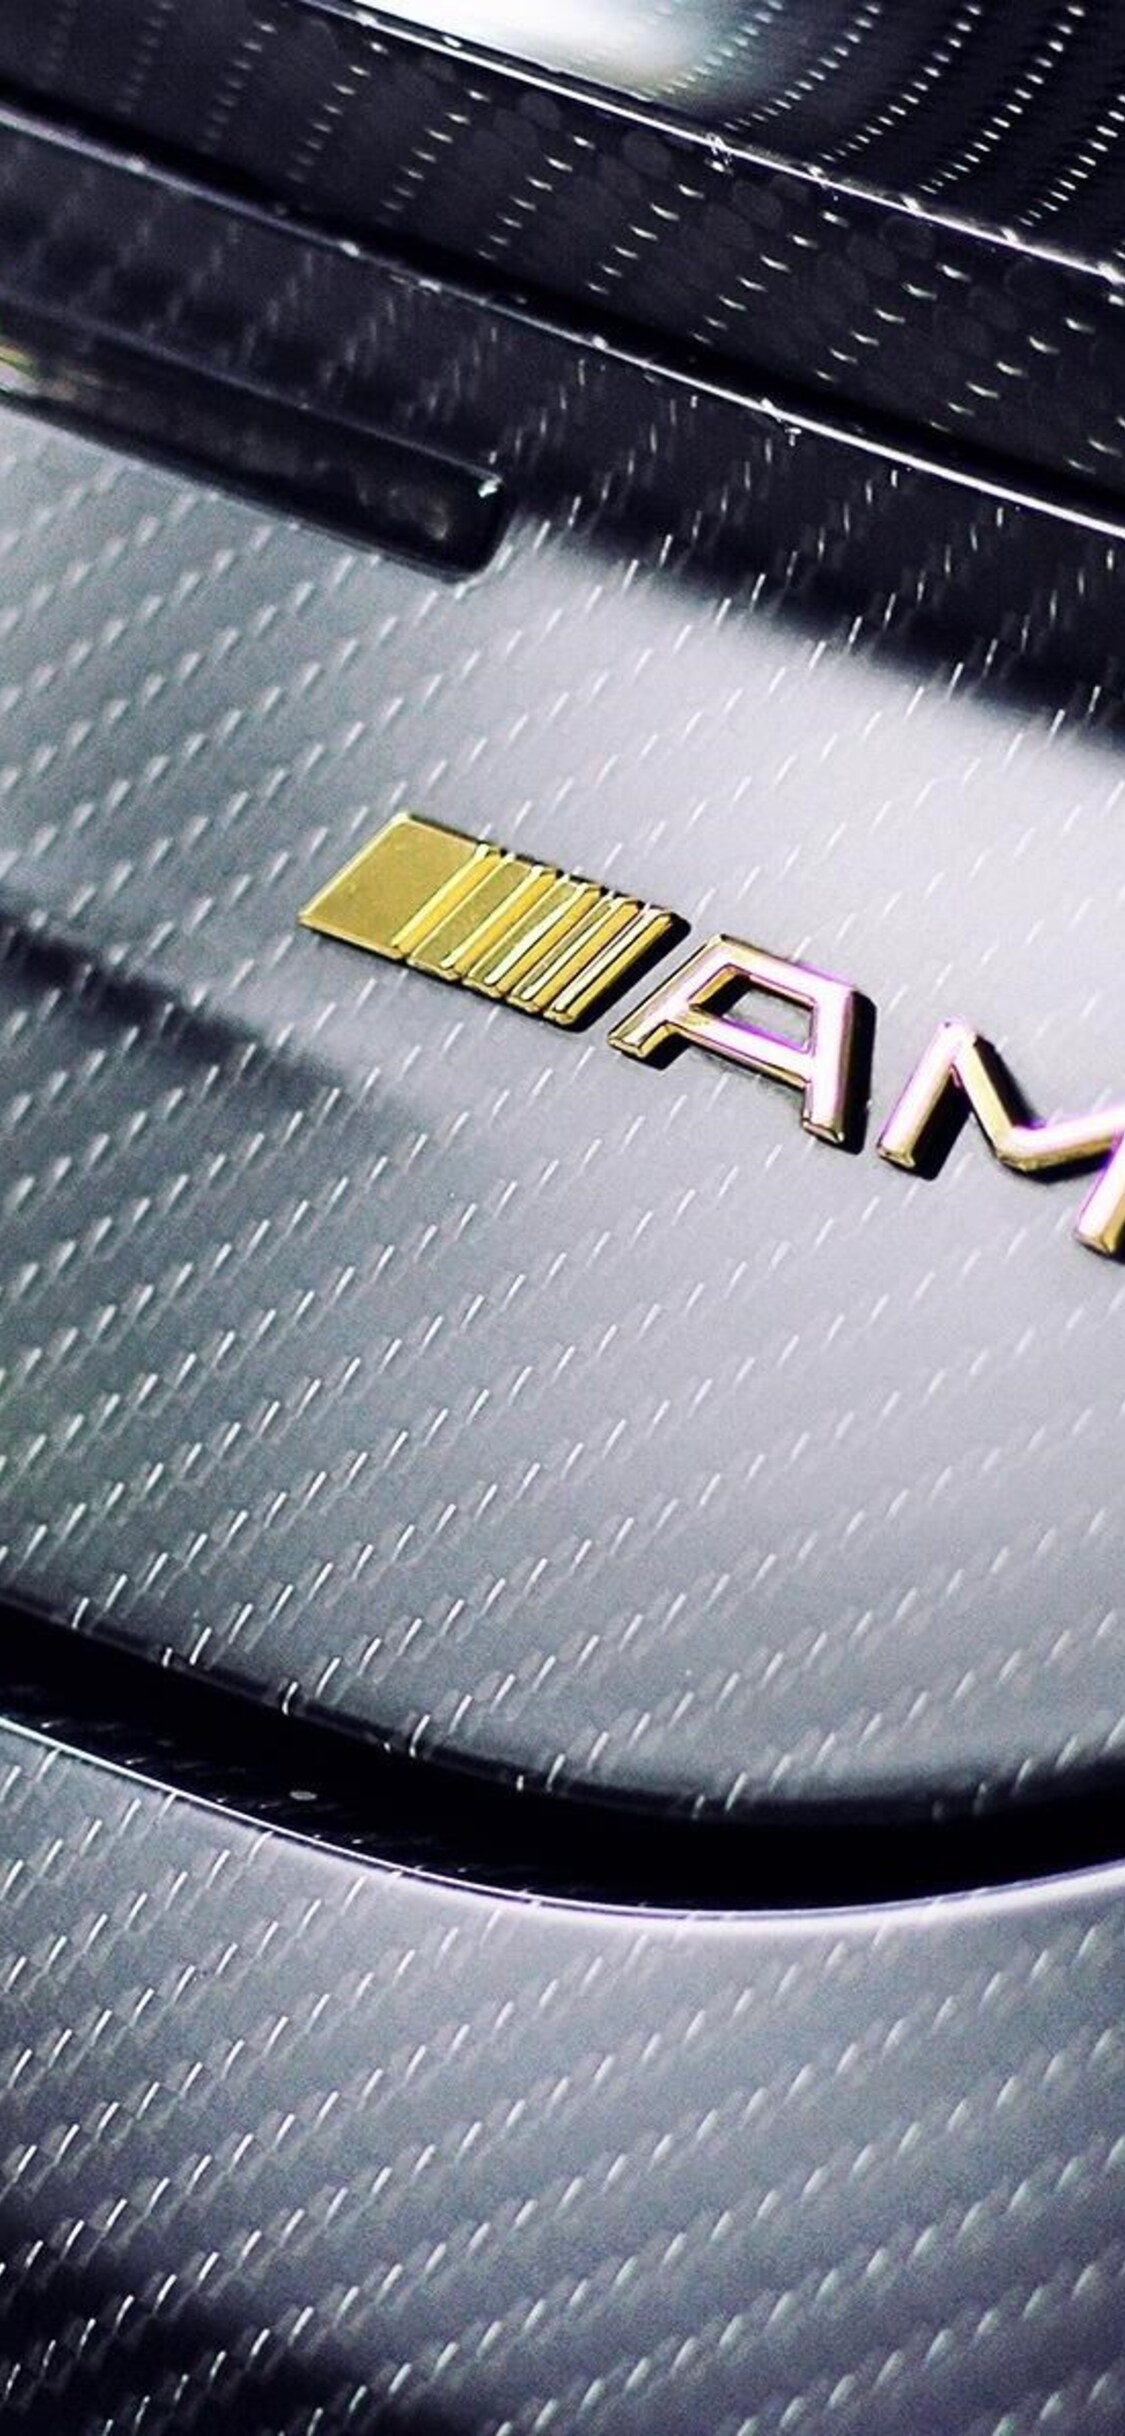 1125x2436 Mercedes Amg Gold Logo Iphone Xs Iphone 10 Iphone